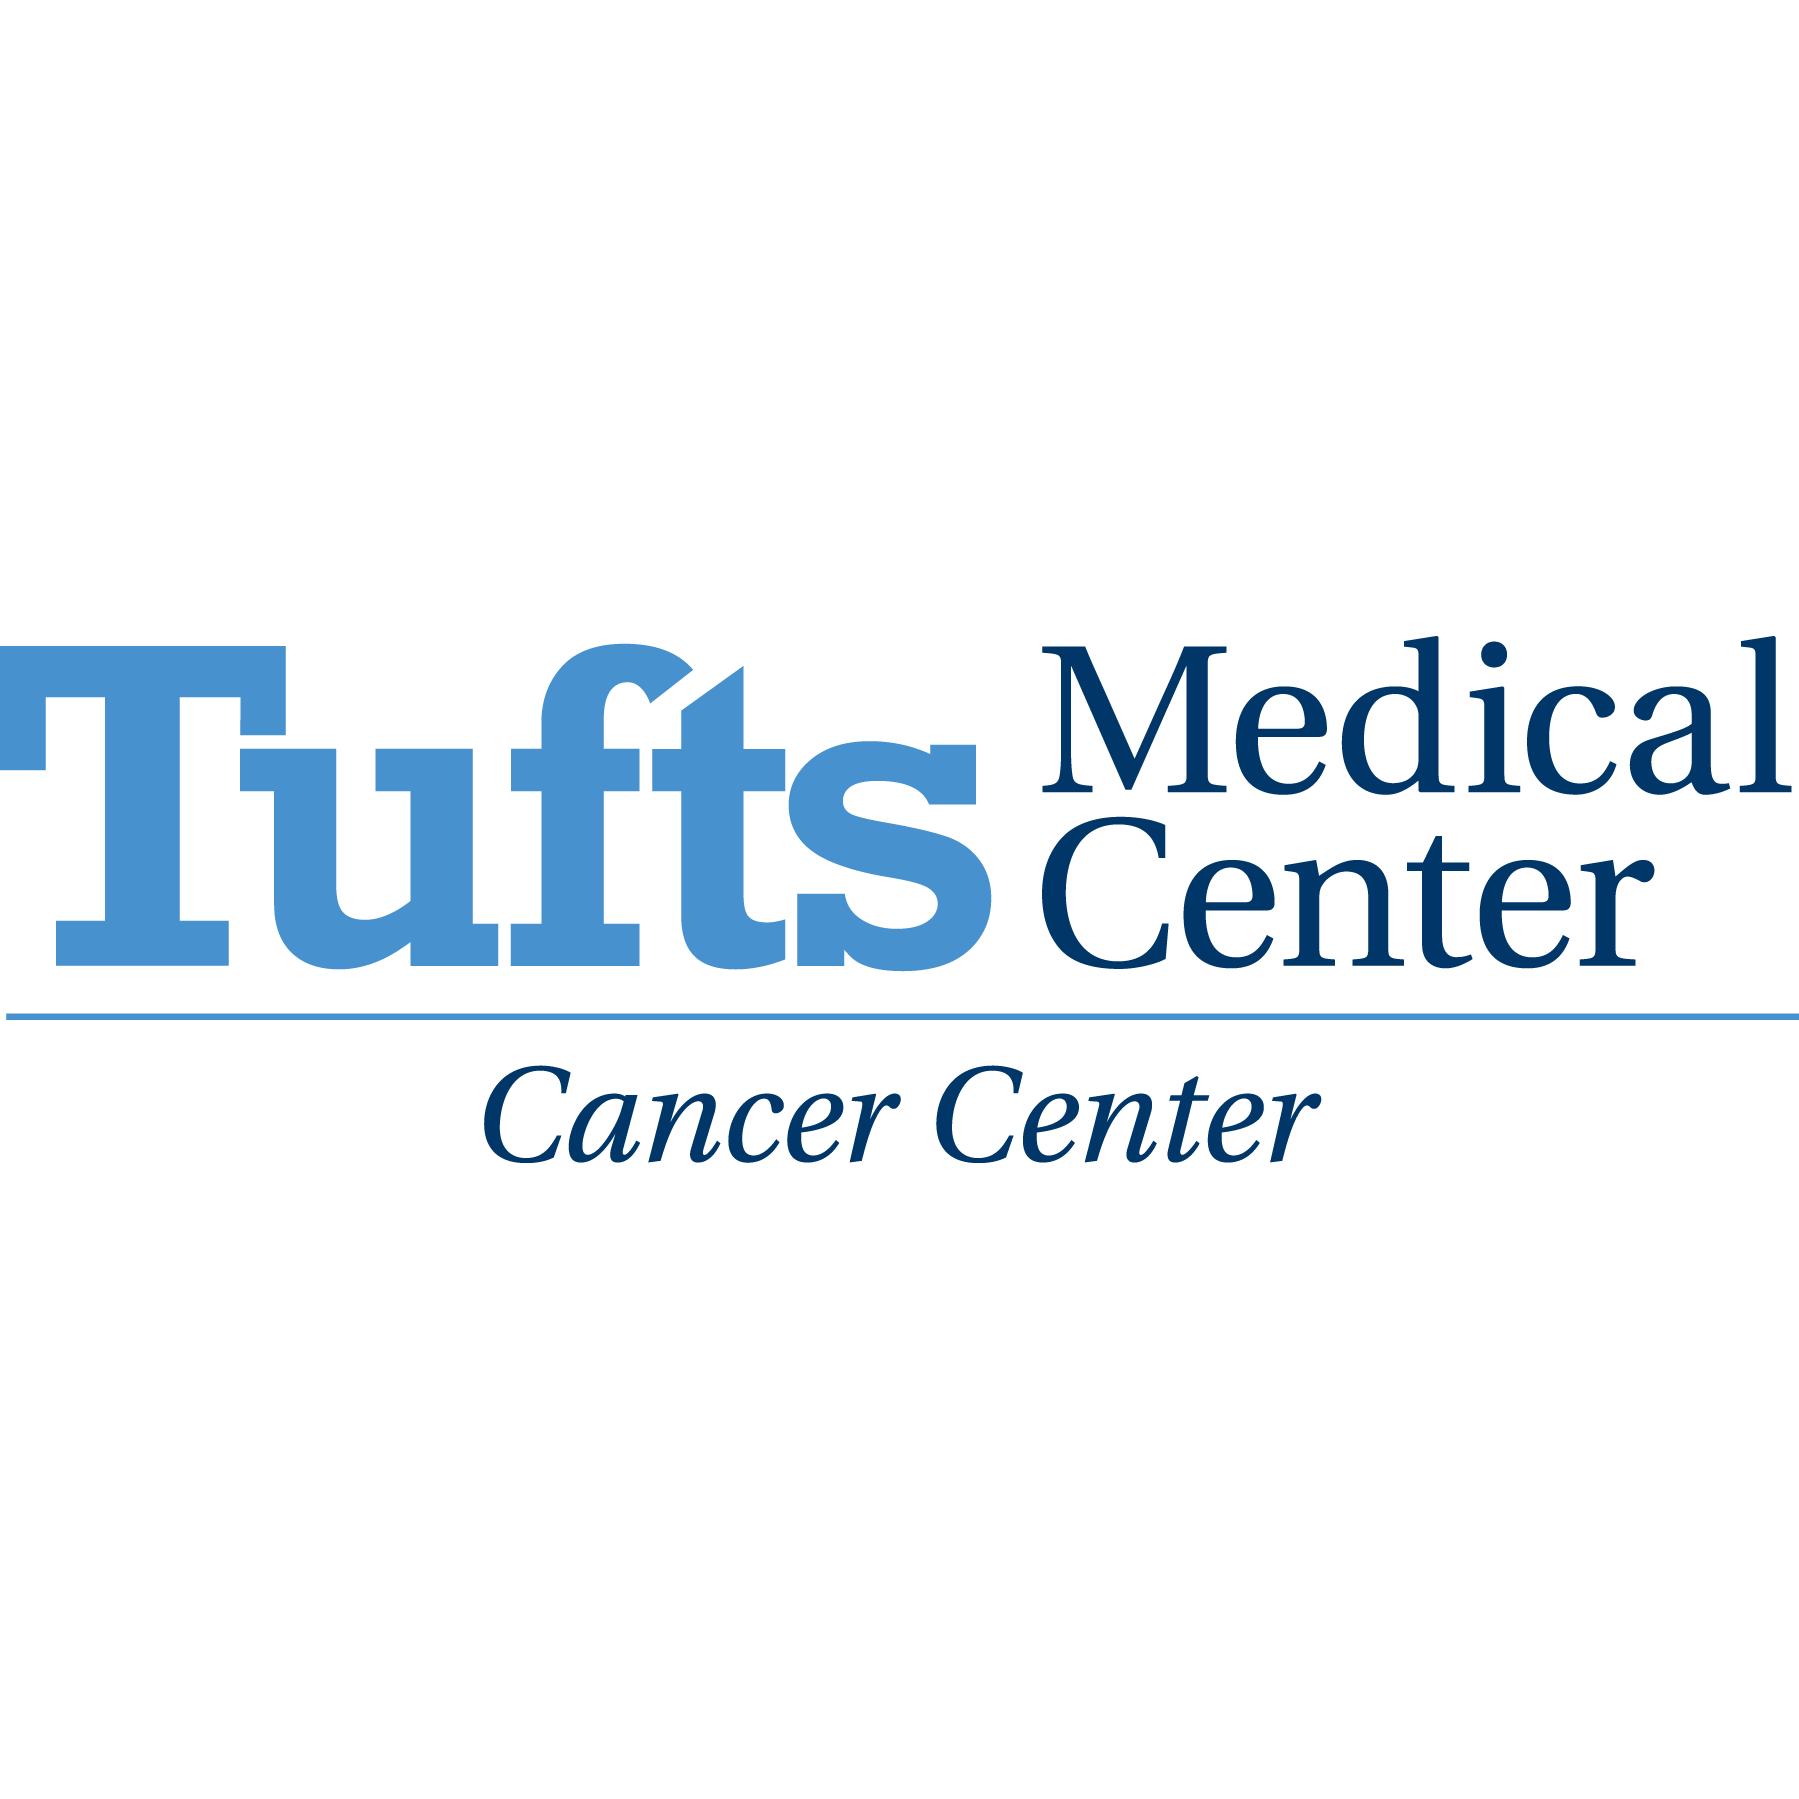 Tufts Medical Center Cancer Center Stoneham